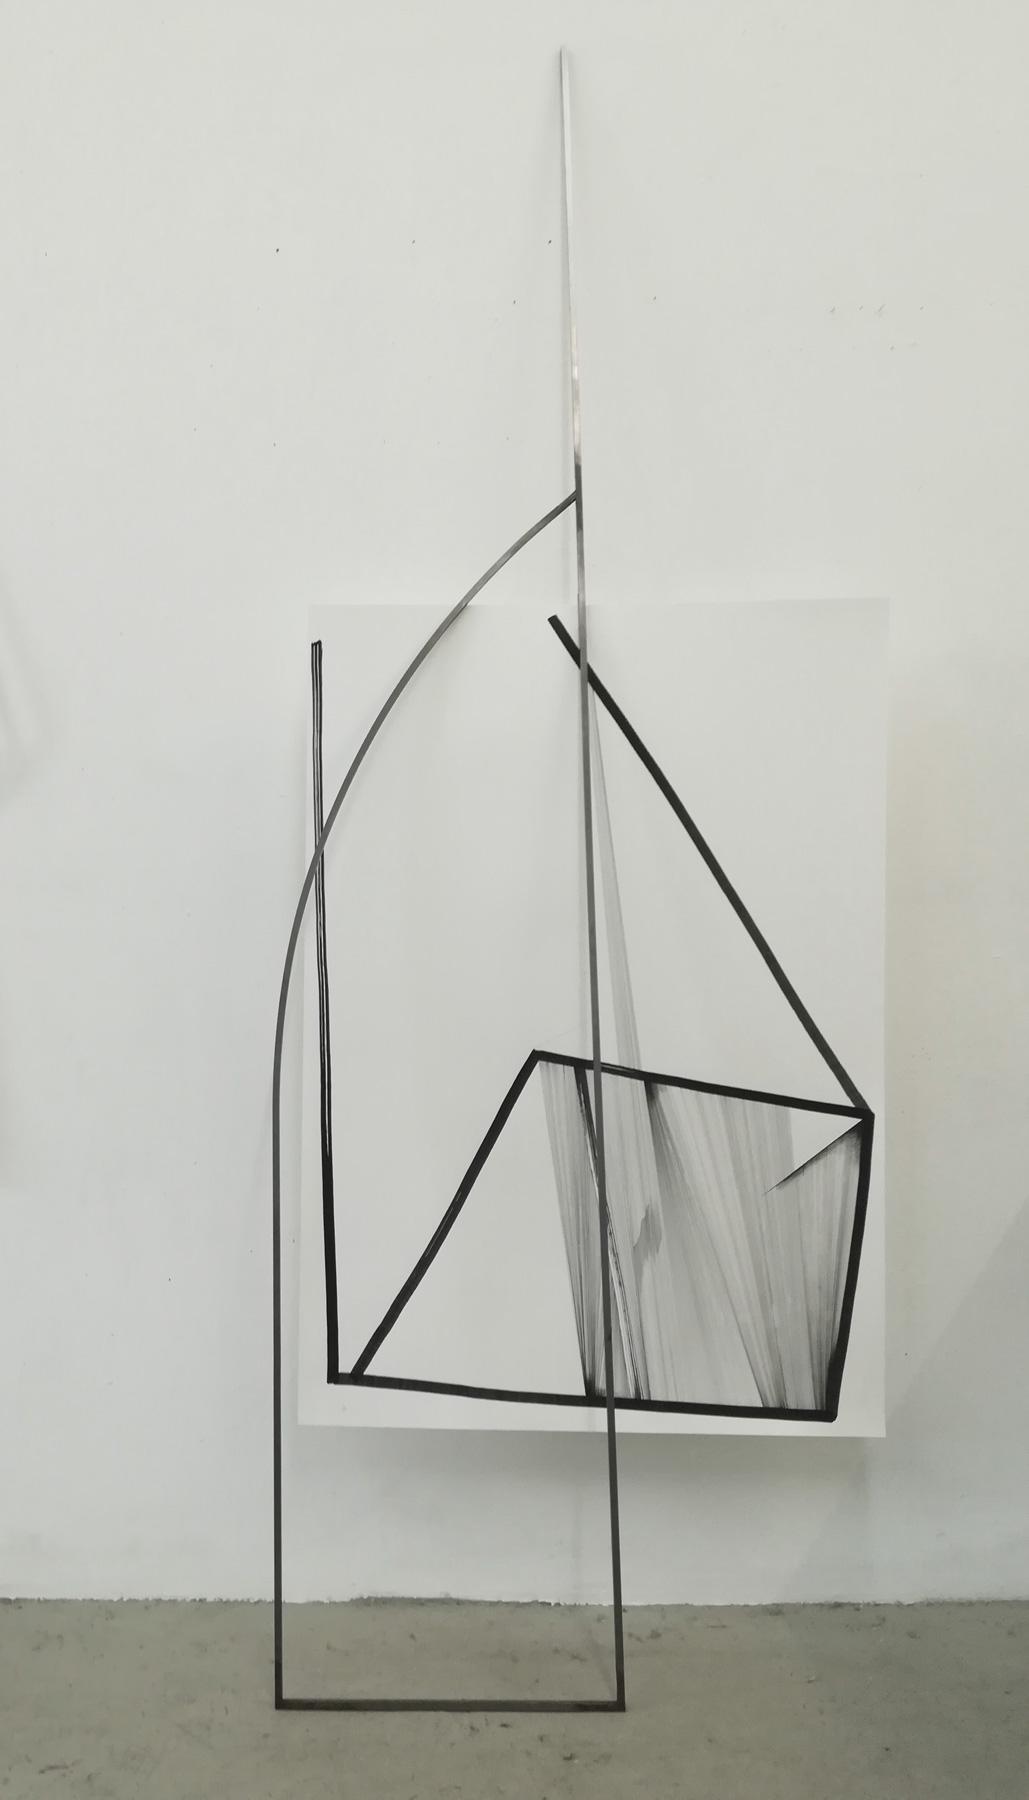 Nina Annabelle Märkl | Frames | ink and steel | 200 x 75 x 20 cm | 2018